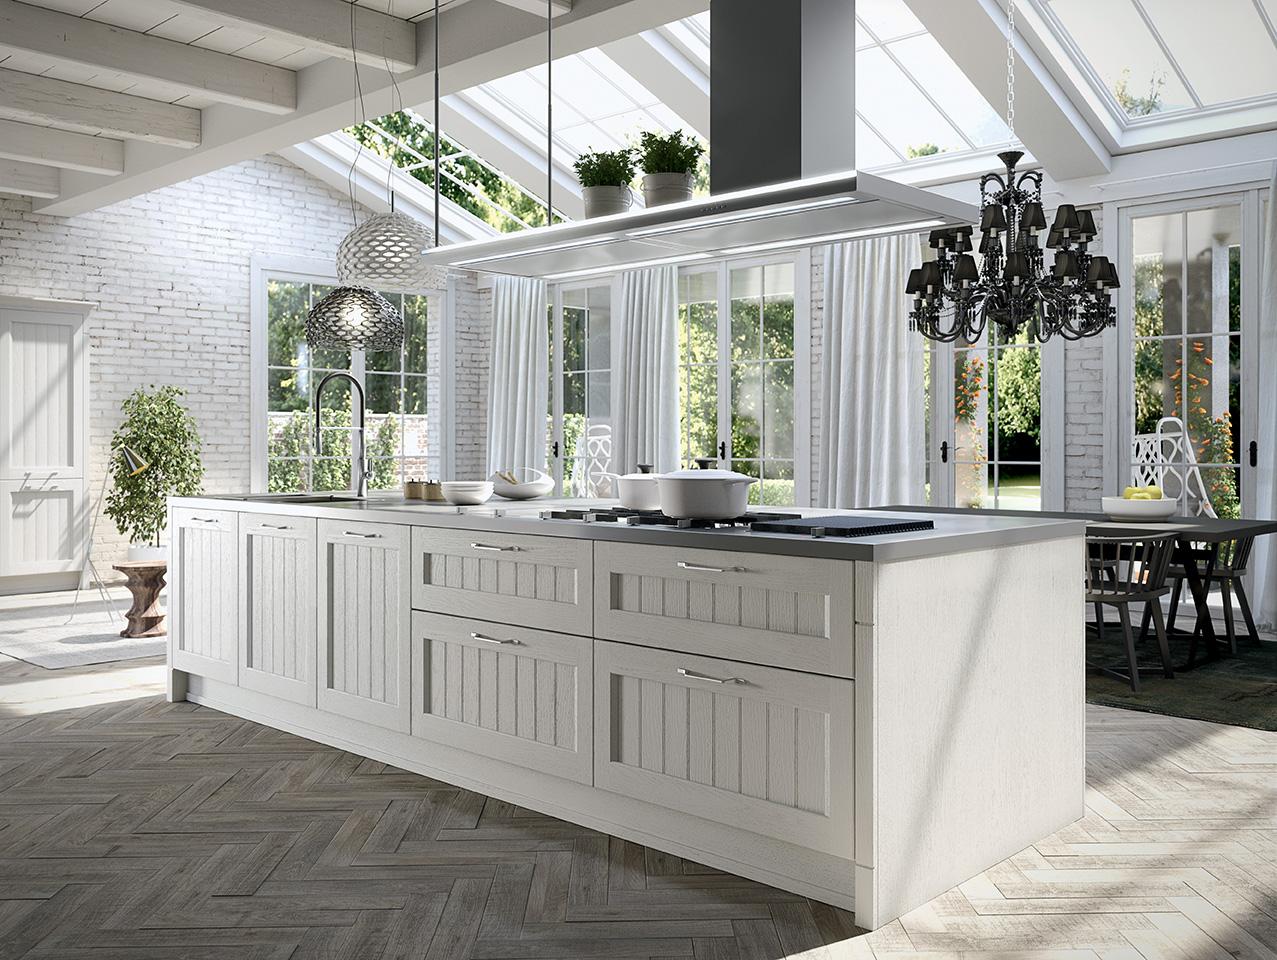 Arrital sevilla cocinas italianas de dise o kocina sevilla - Cocinas de diseno en sevilla ...